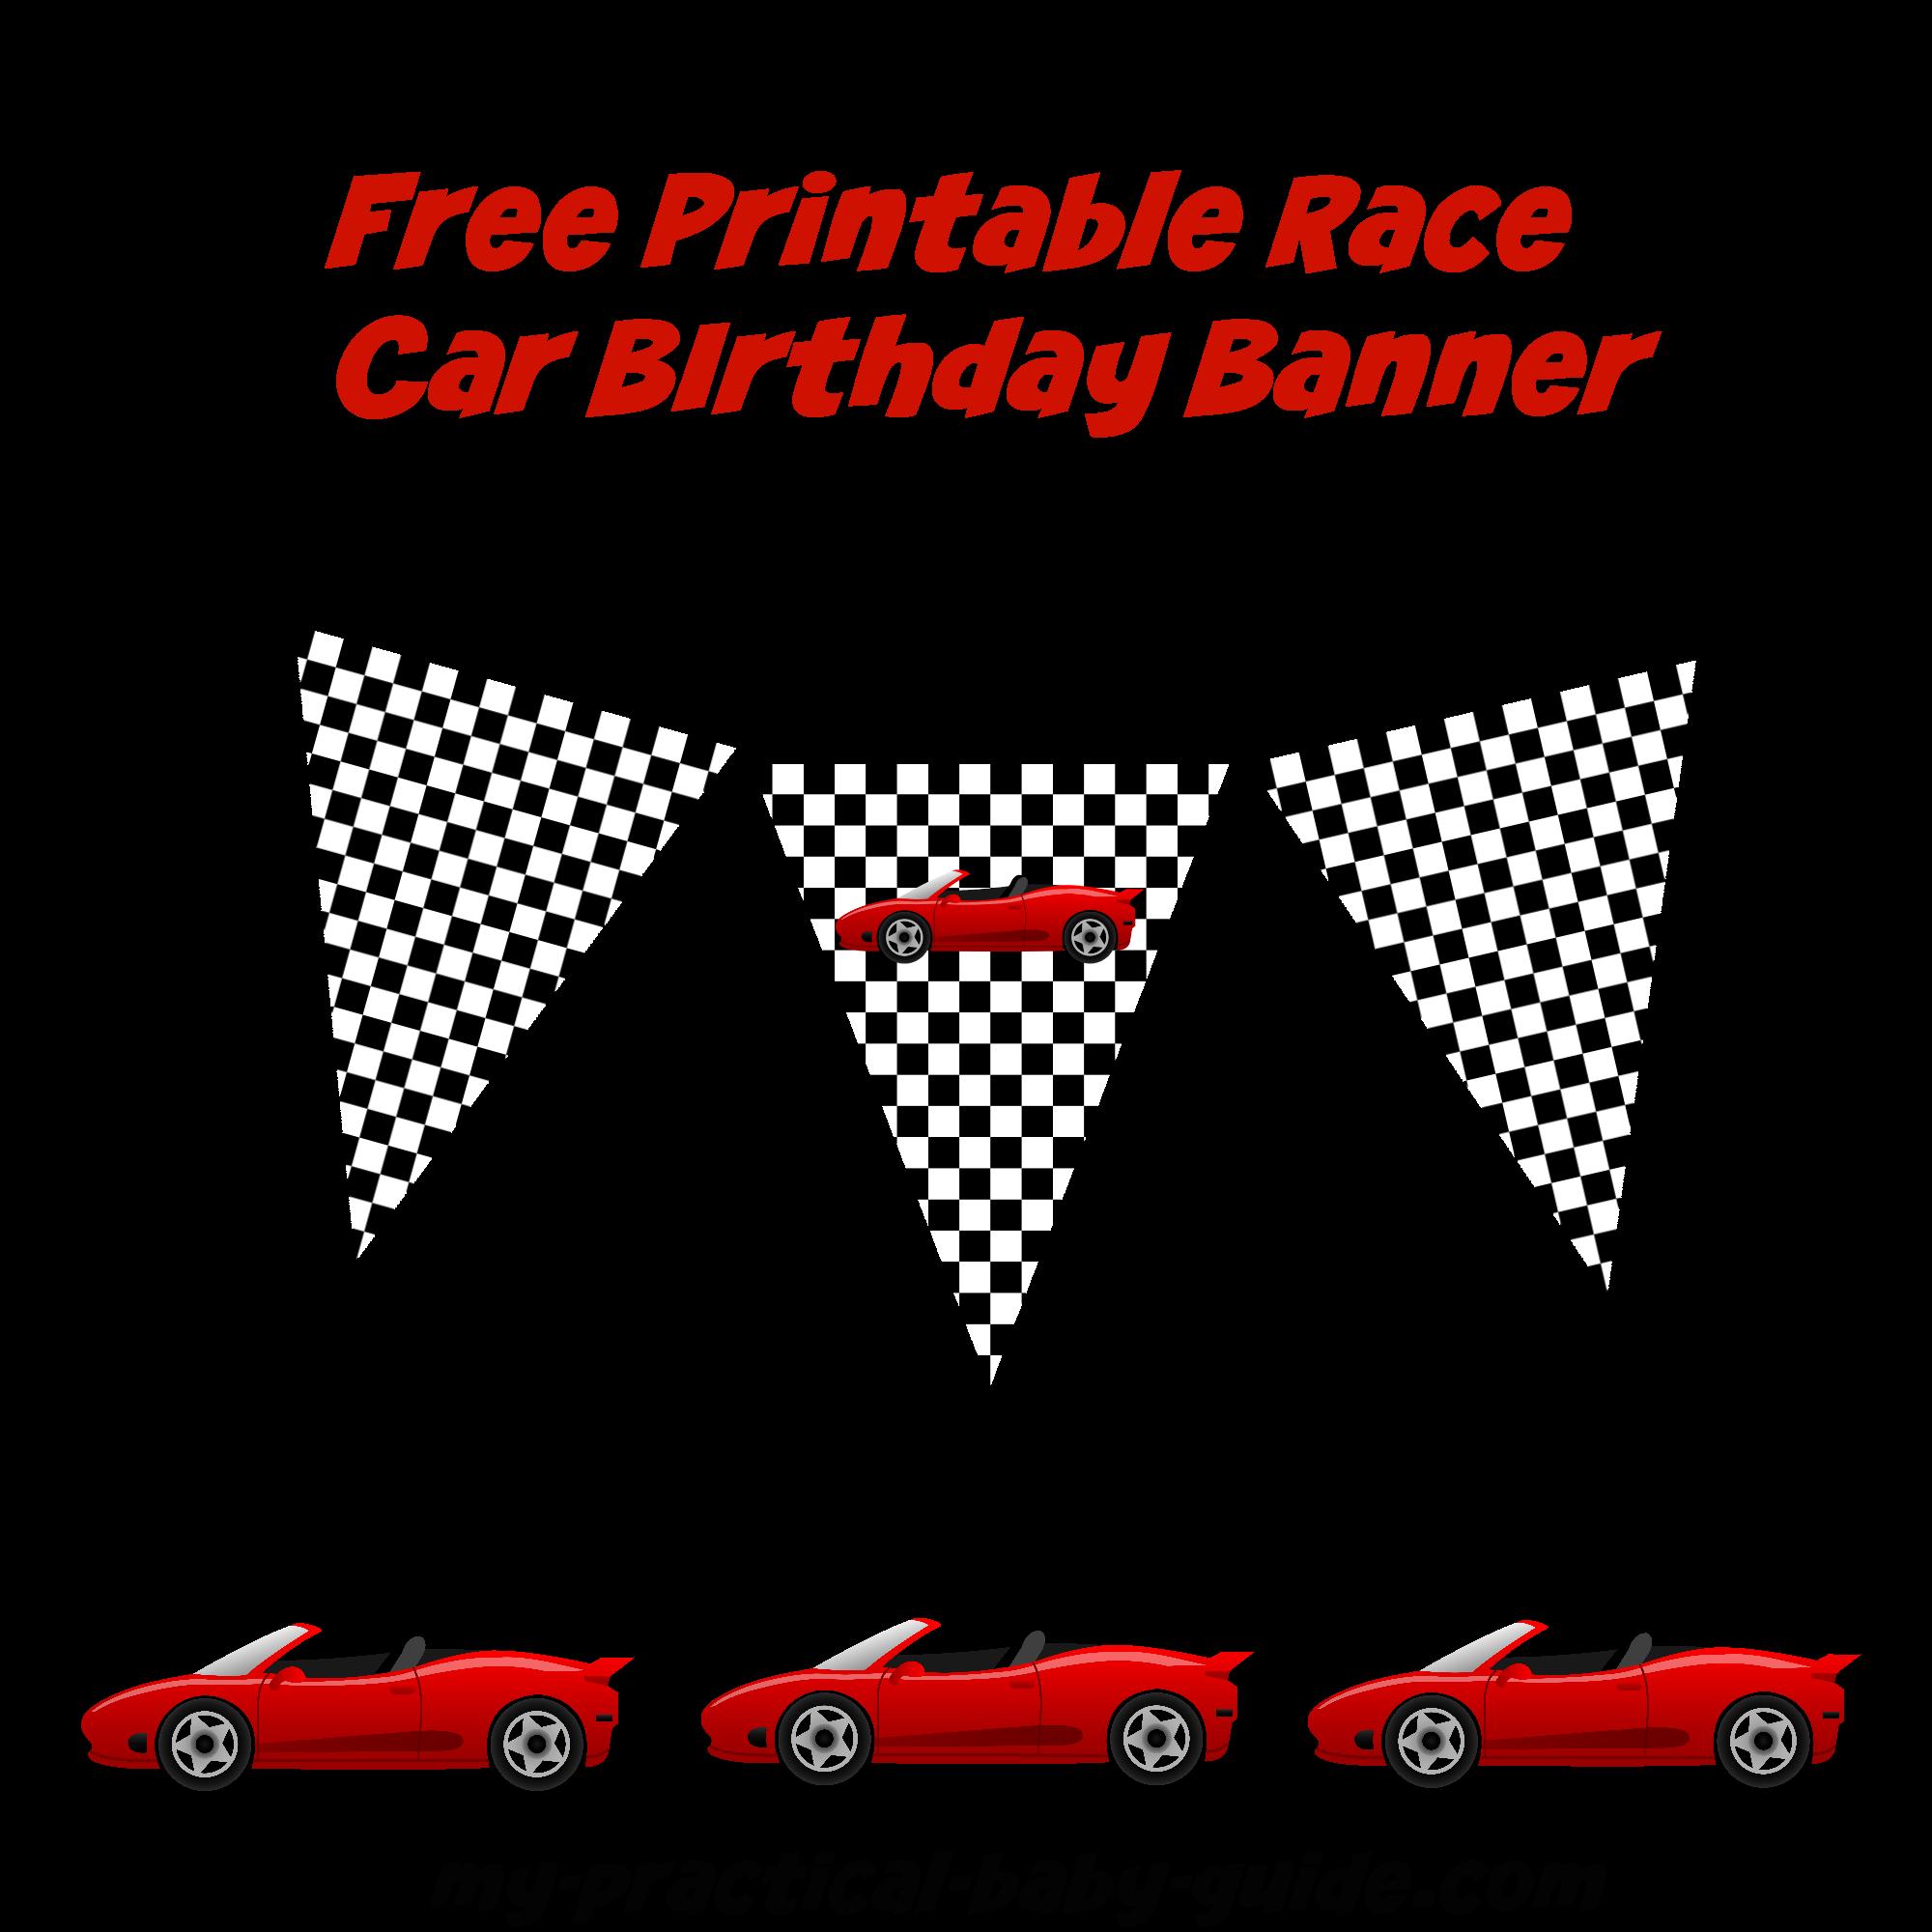 Race clipart racing banner. Coolest car birthday ideas